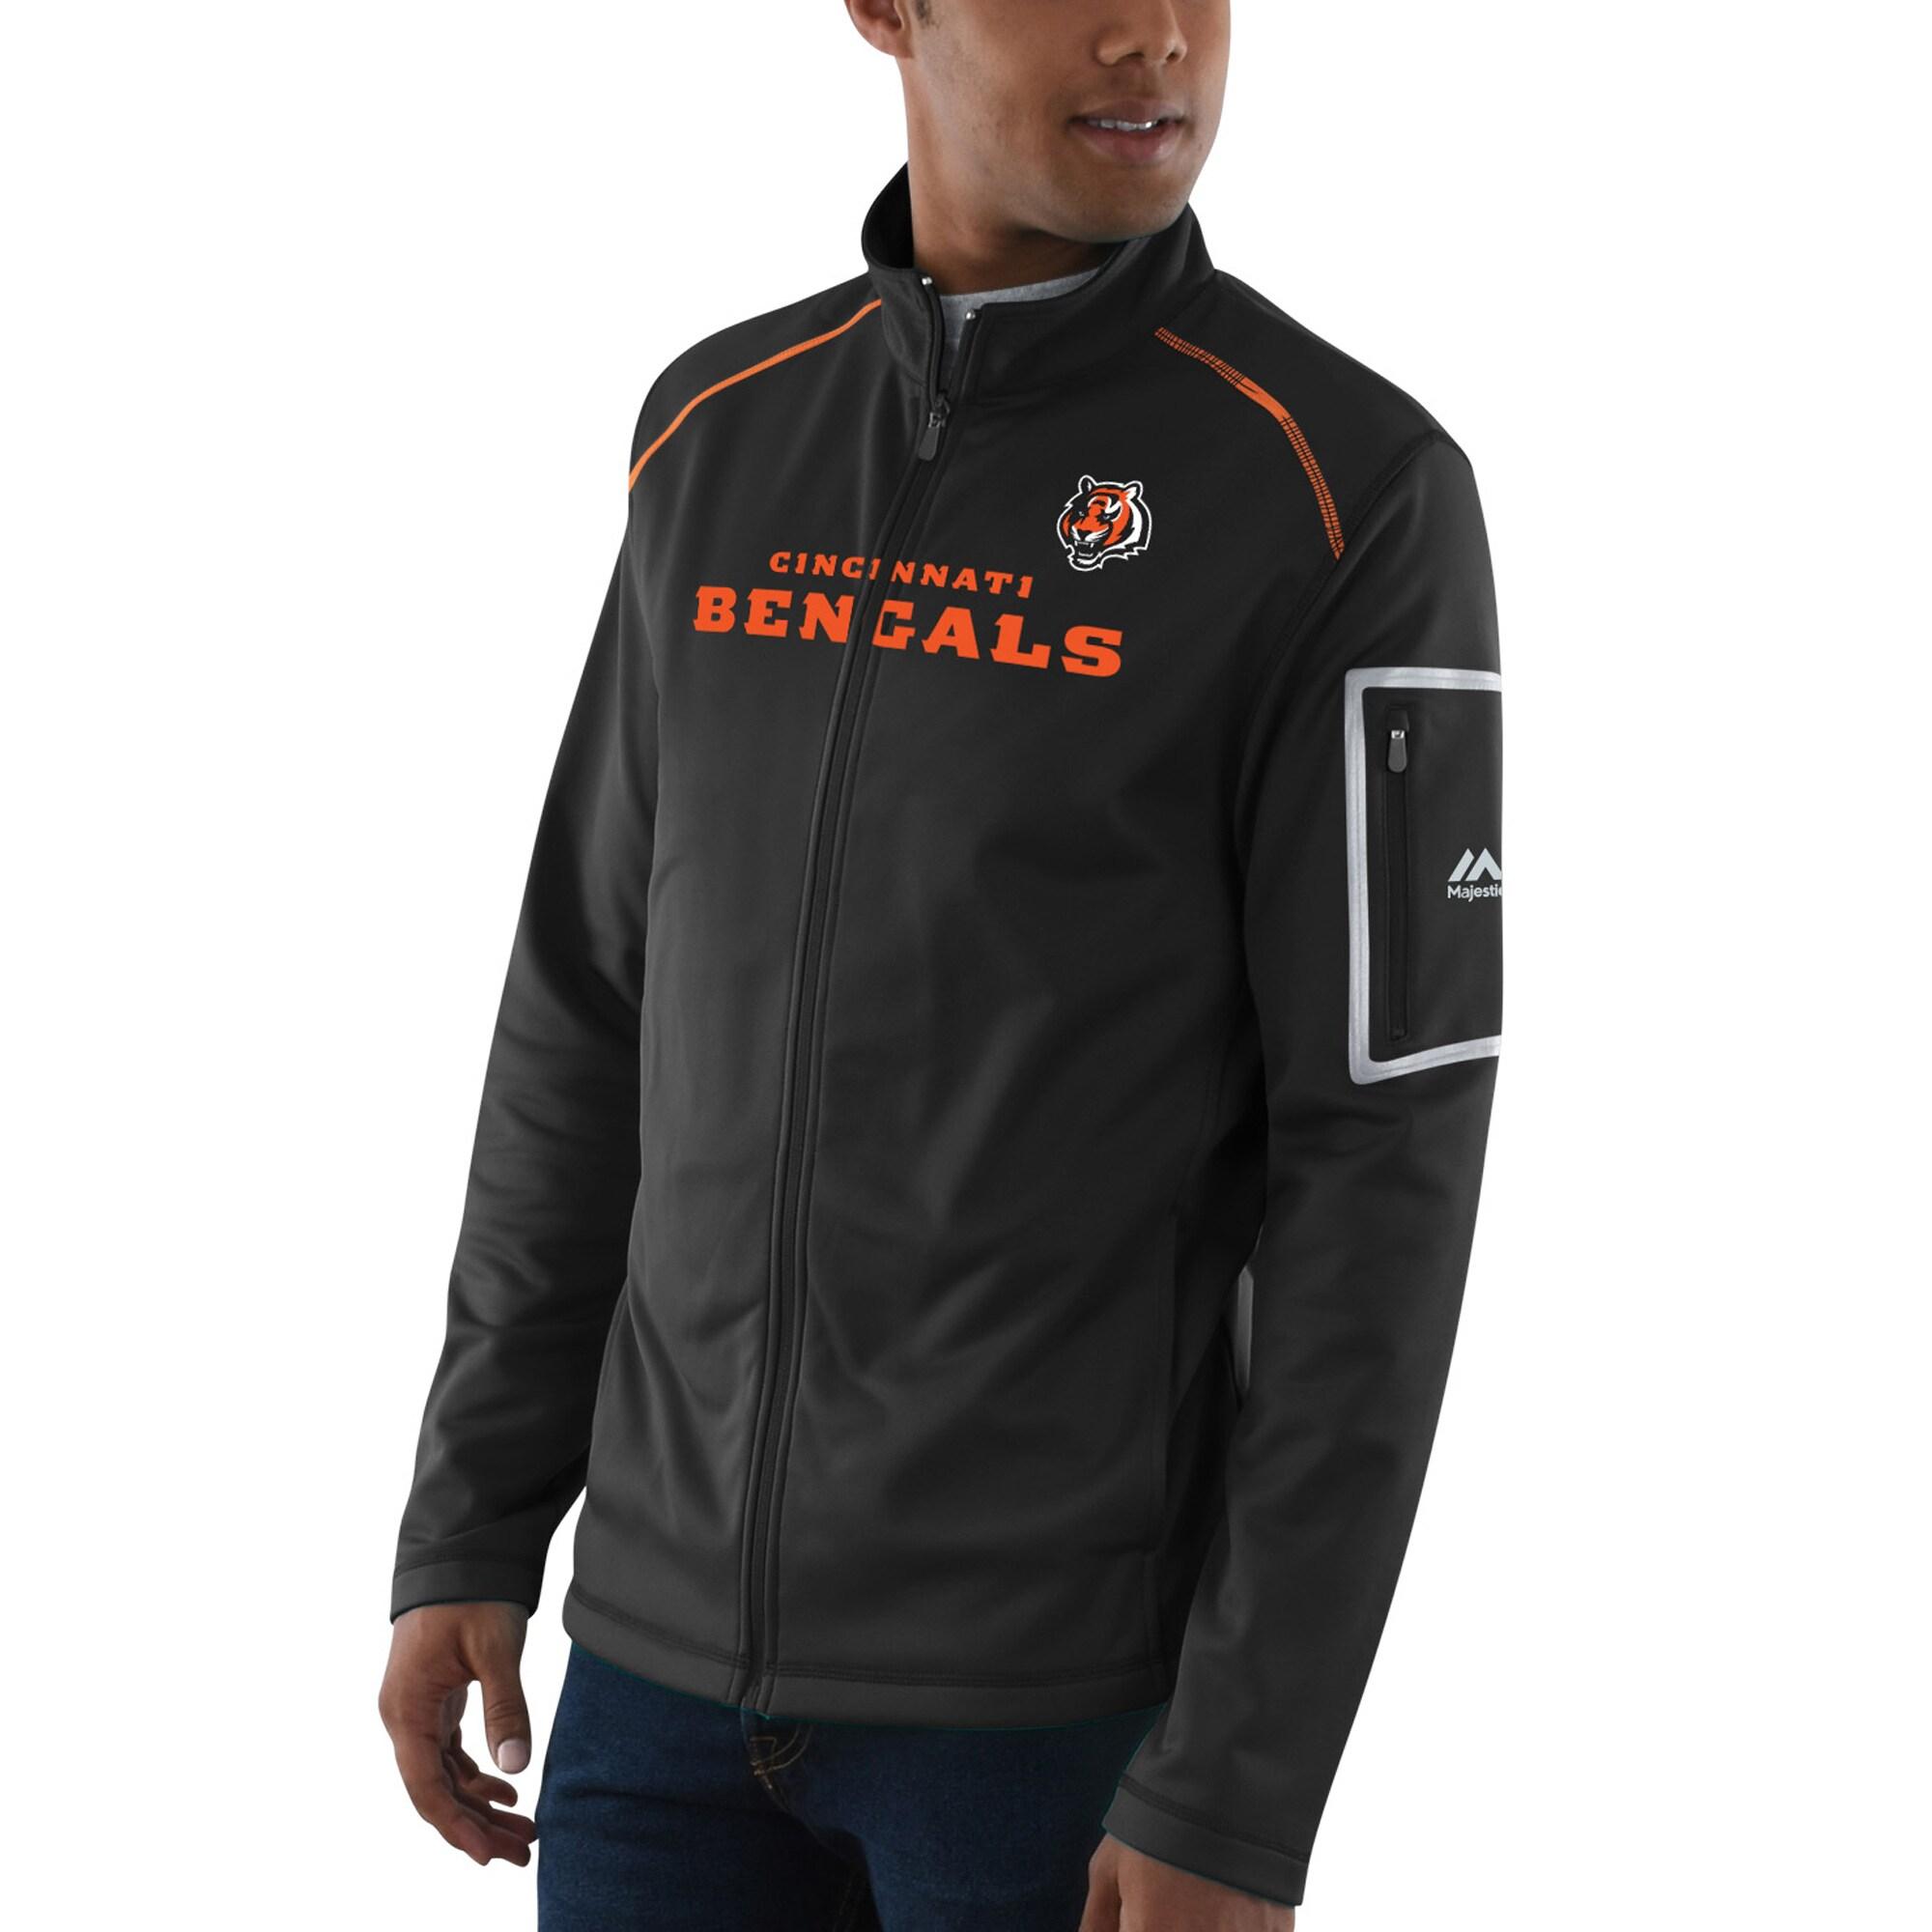 Cincinnati Bengals Majestic Team Tech Track Jacket - Black